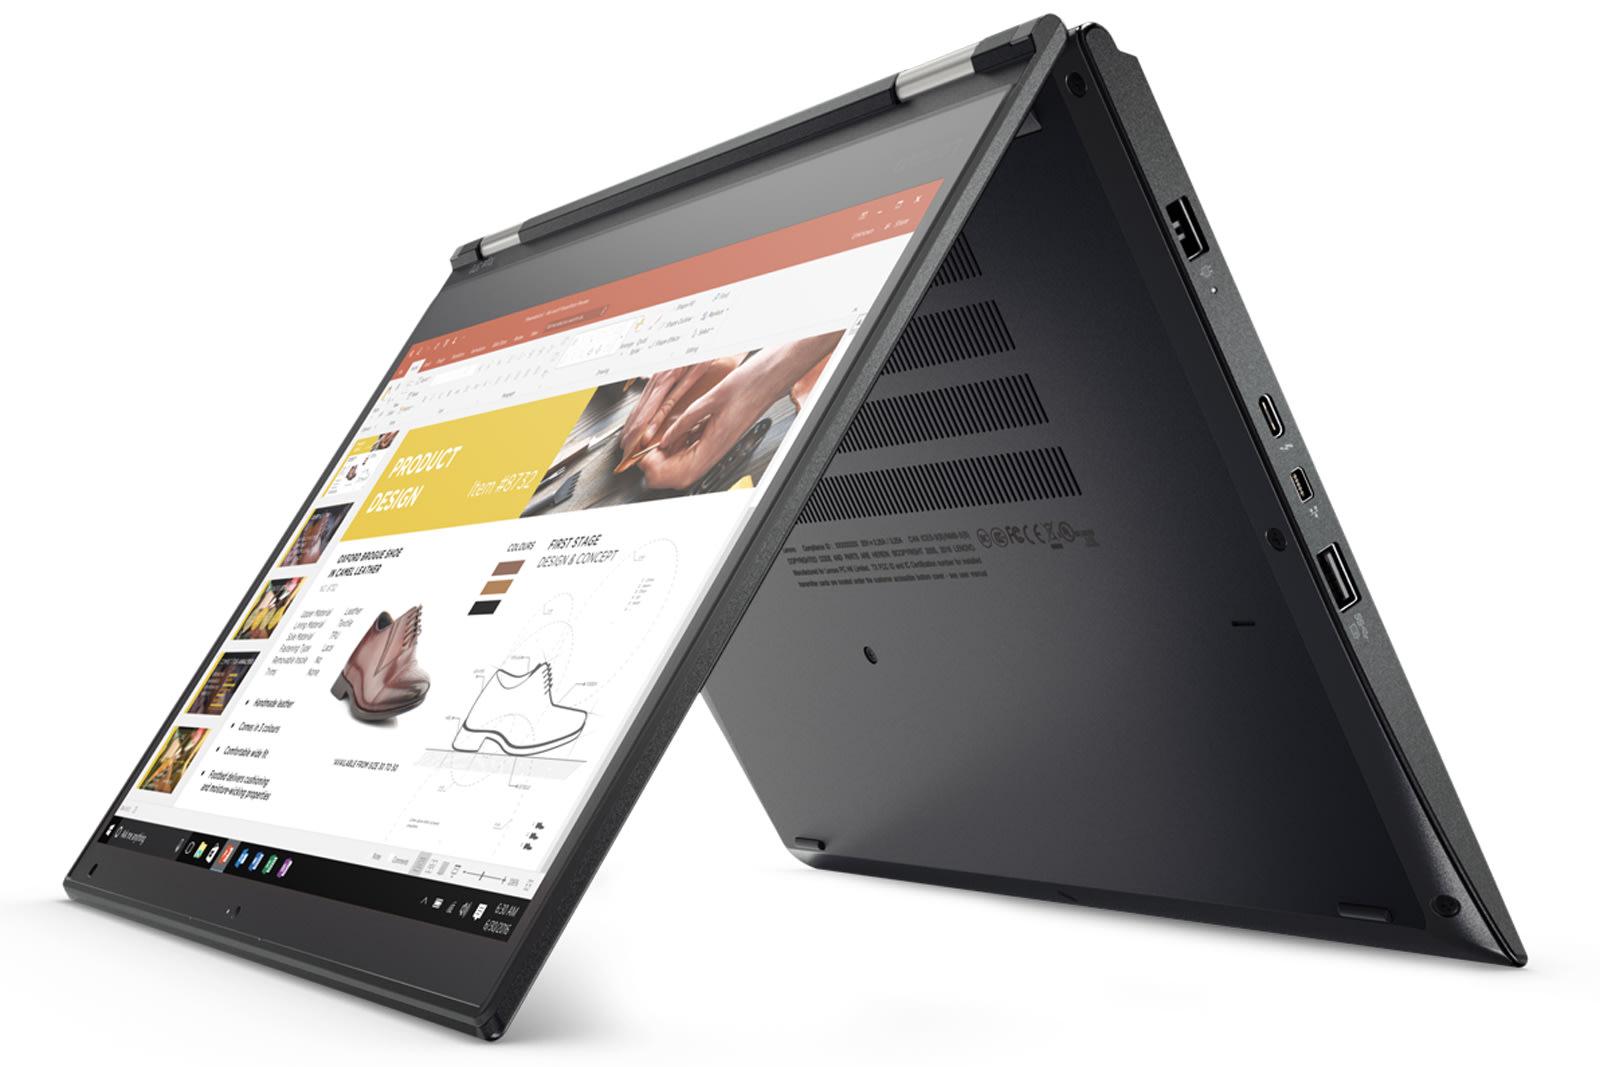 Lenovo's latest ThinkPads ship bloatware-free